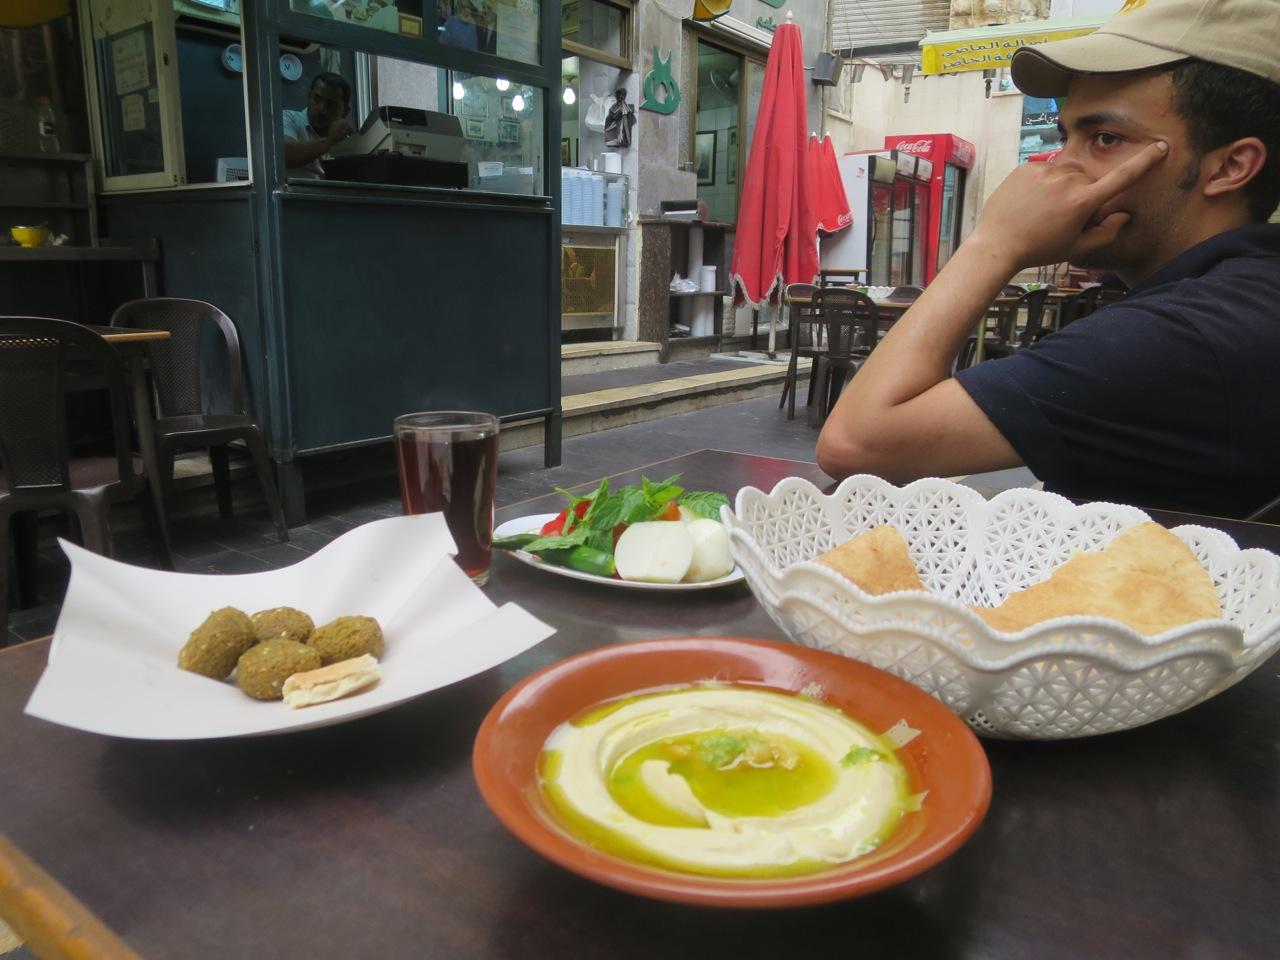 Comida árabe 1-08